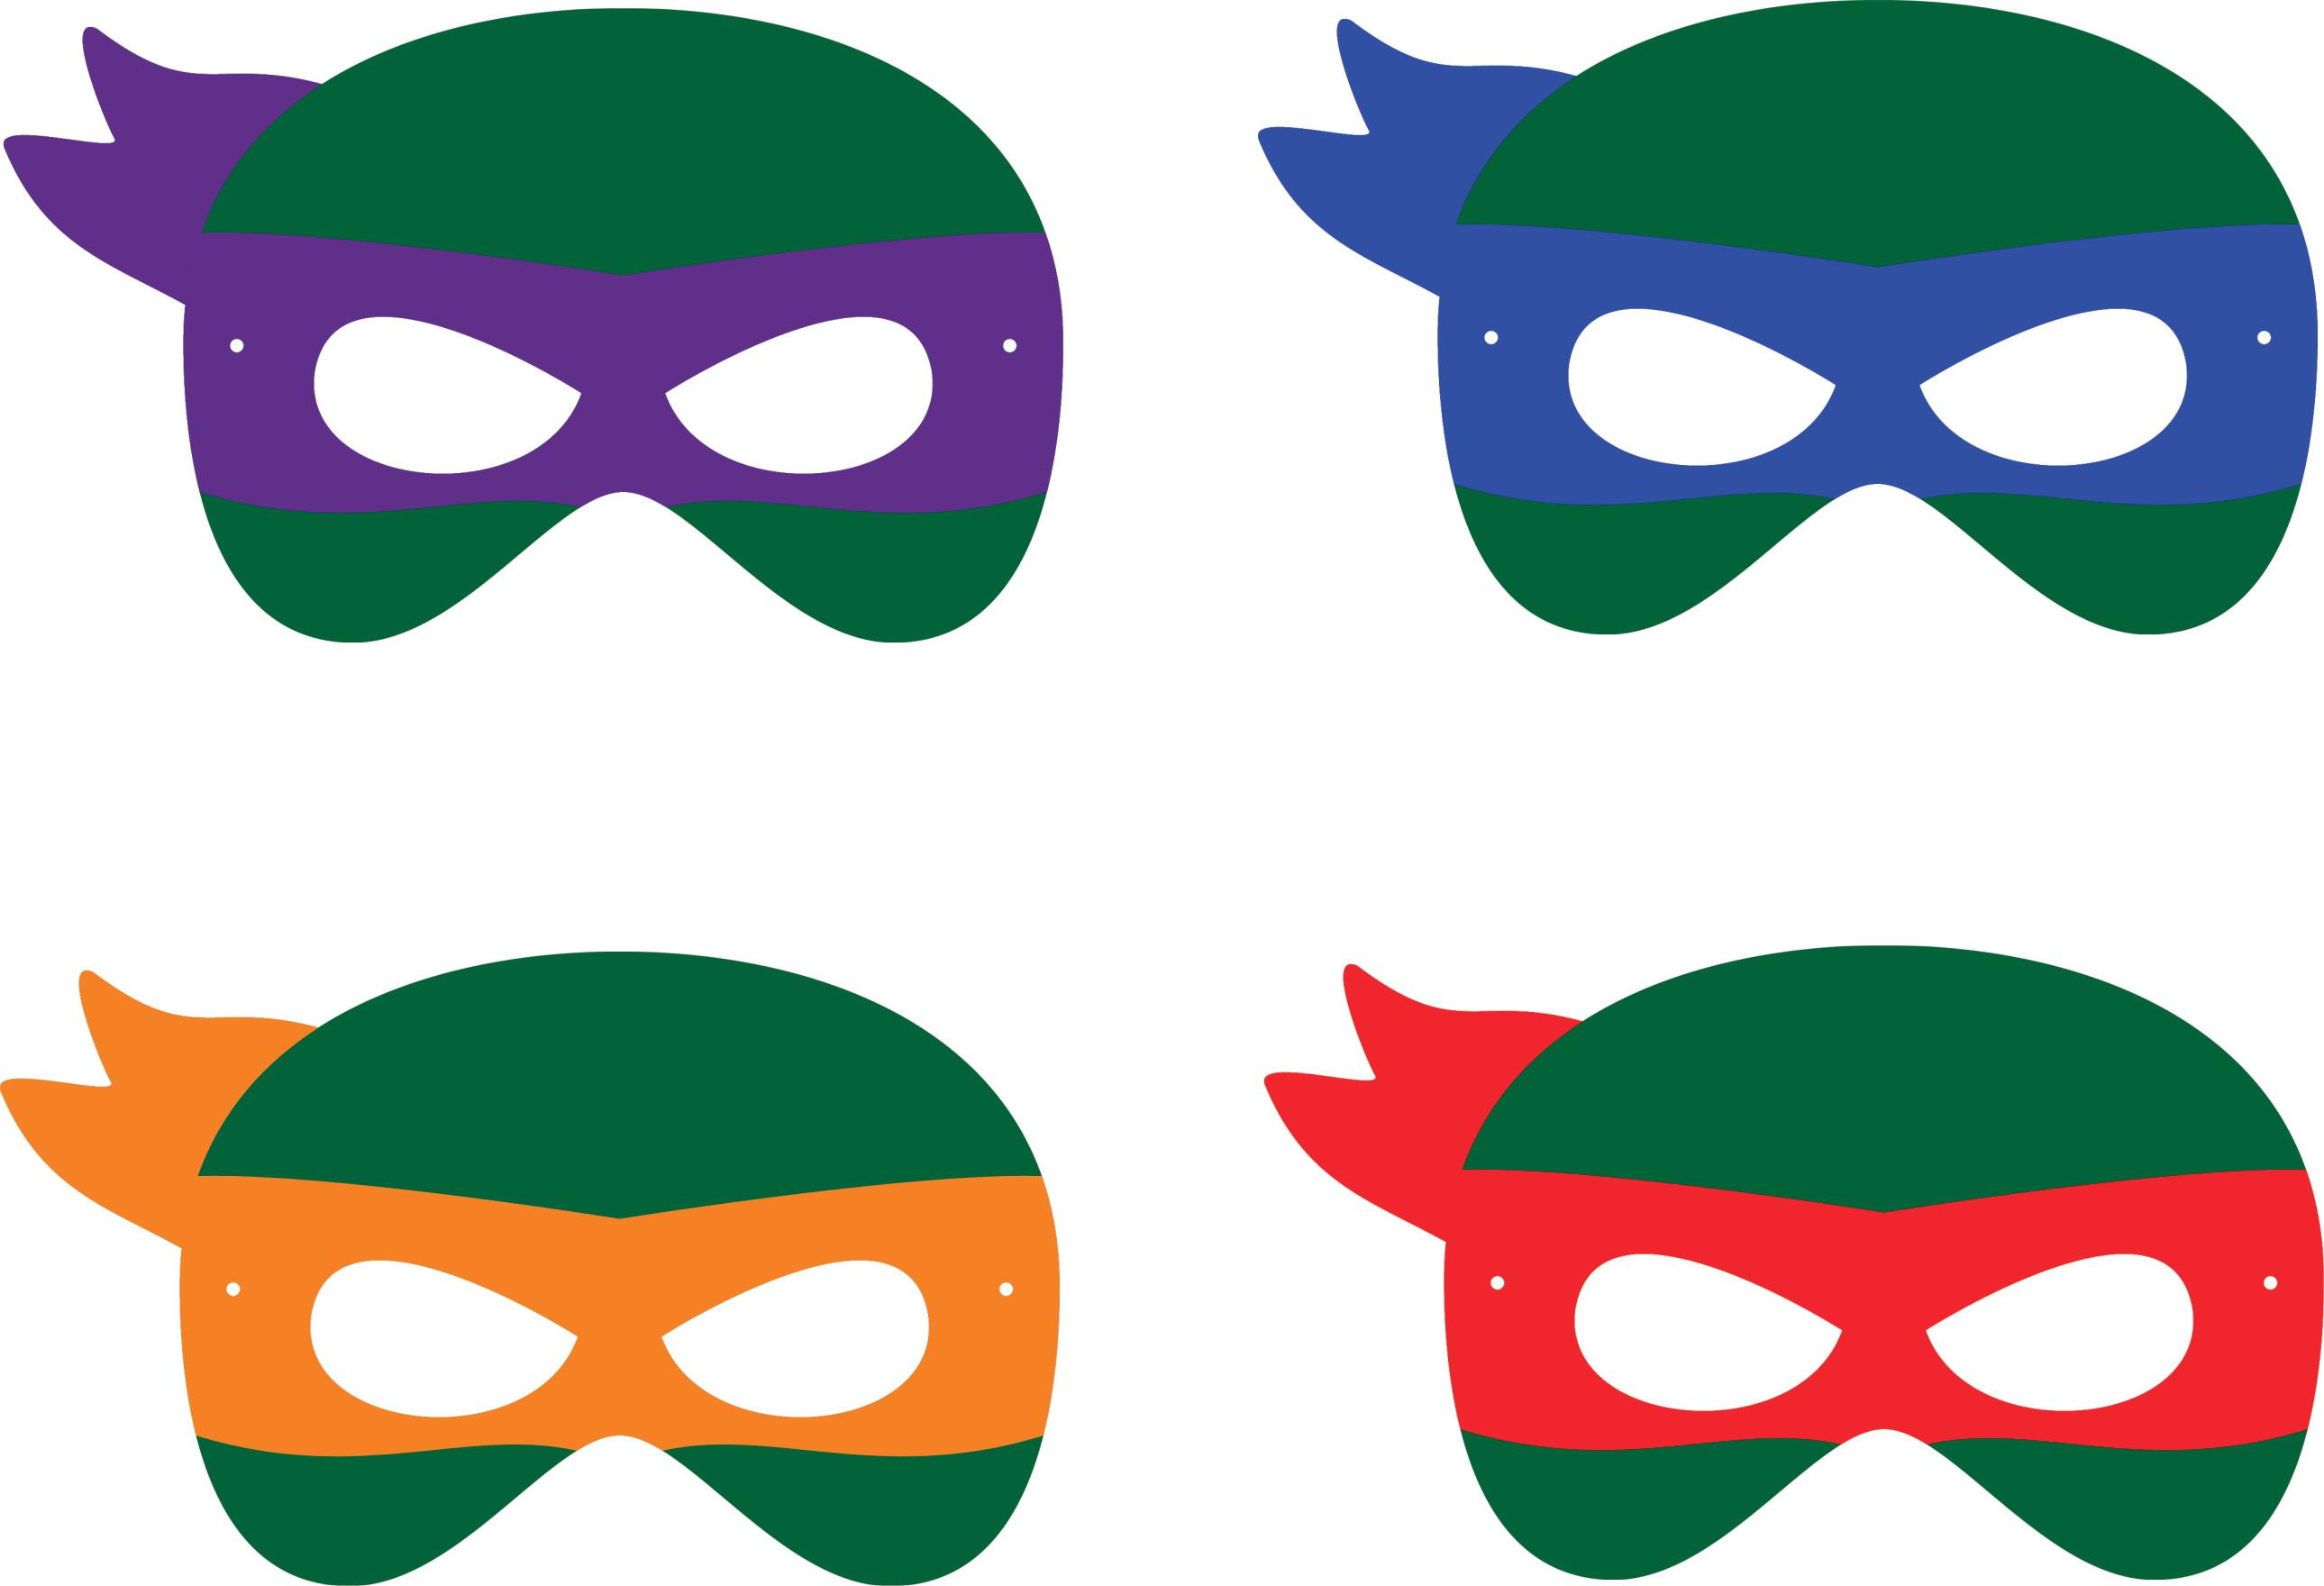 Mascara Tartarugas Ninja No Elo7 Subliime Personalizados C5262f